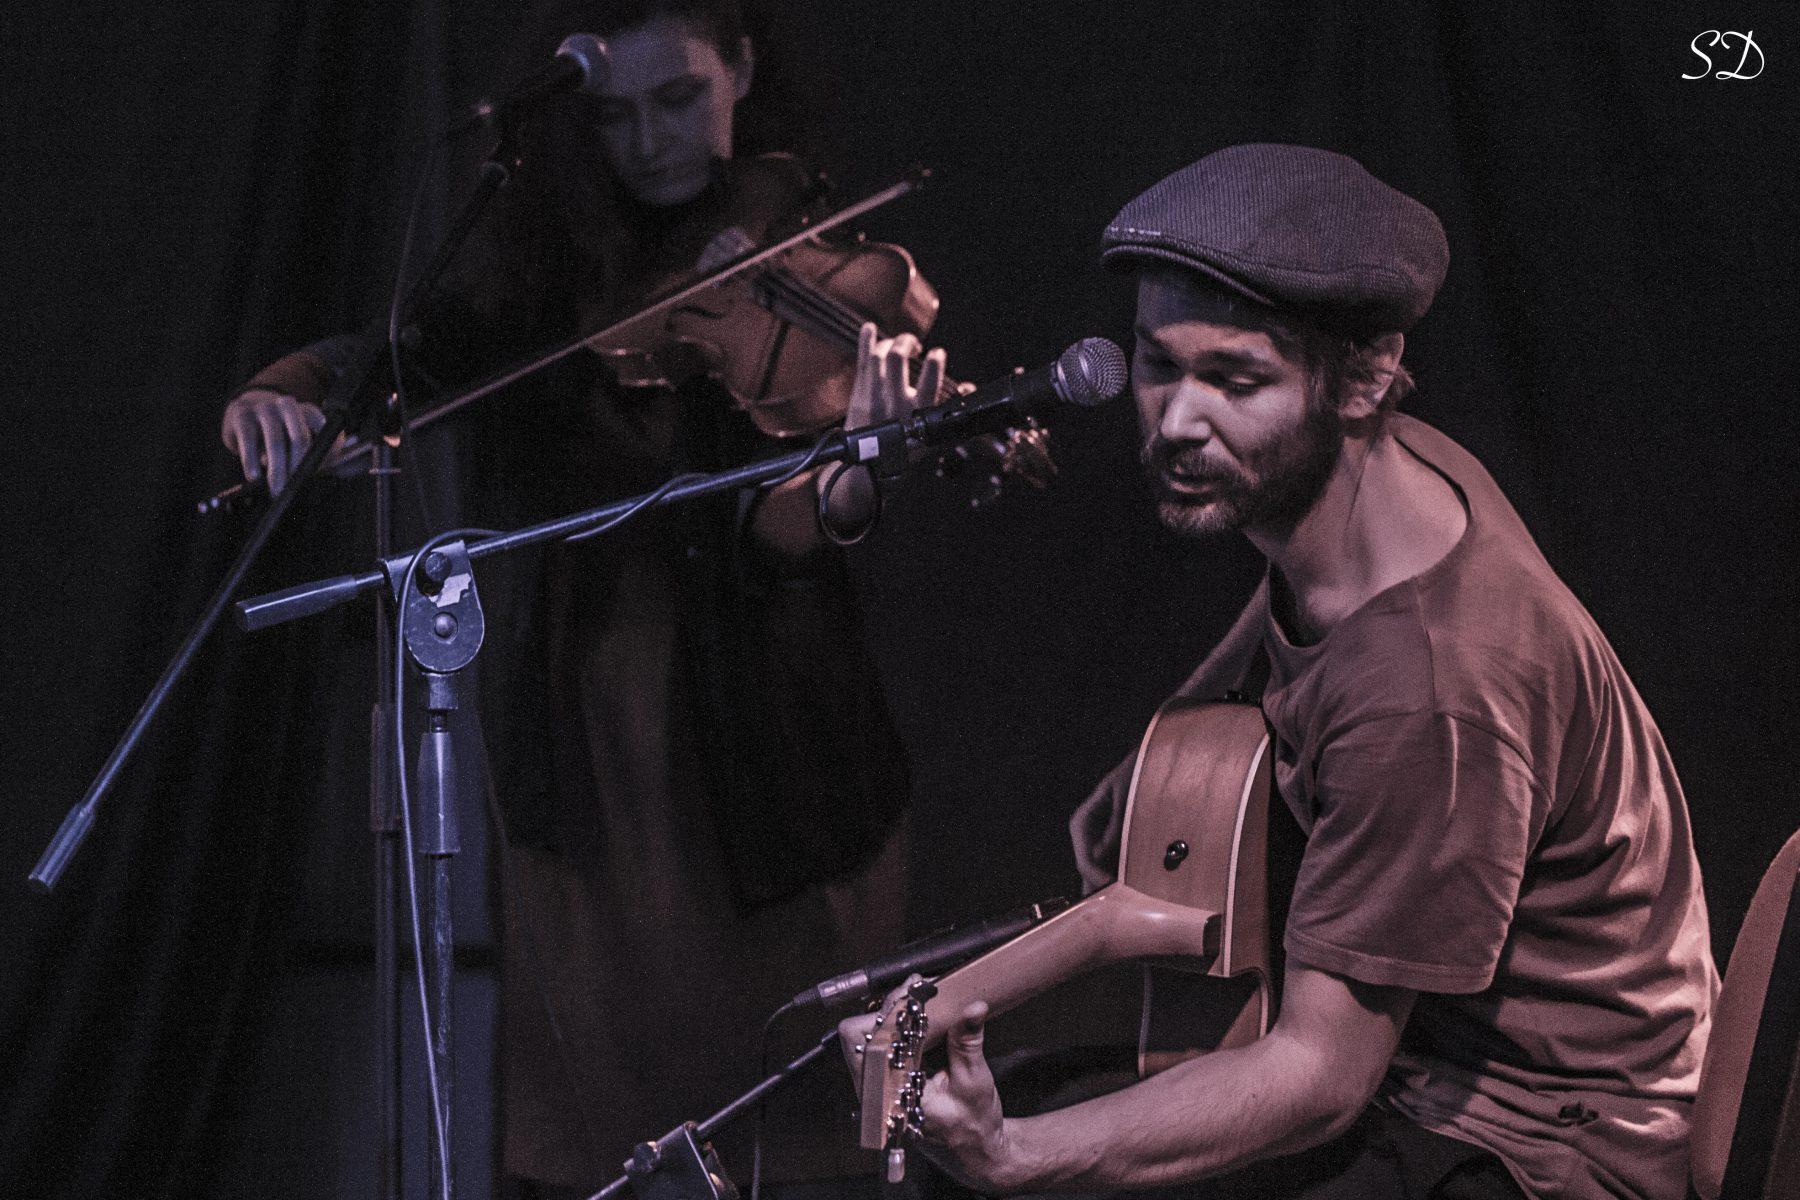 kme - live report - alpine dweller - stefania desotgiu - sa scena sarda - 2019 - karel music expo